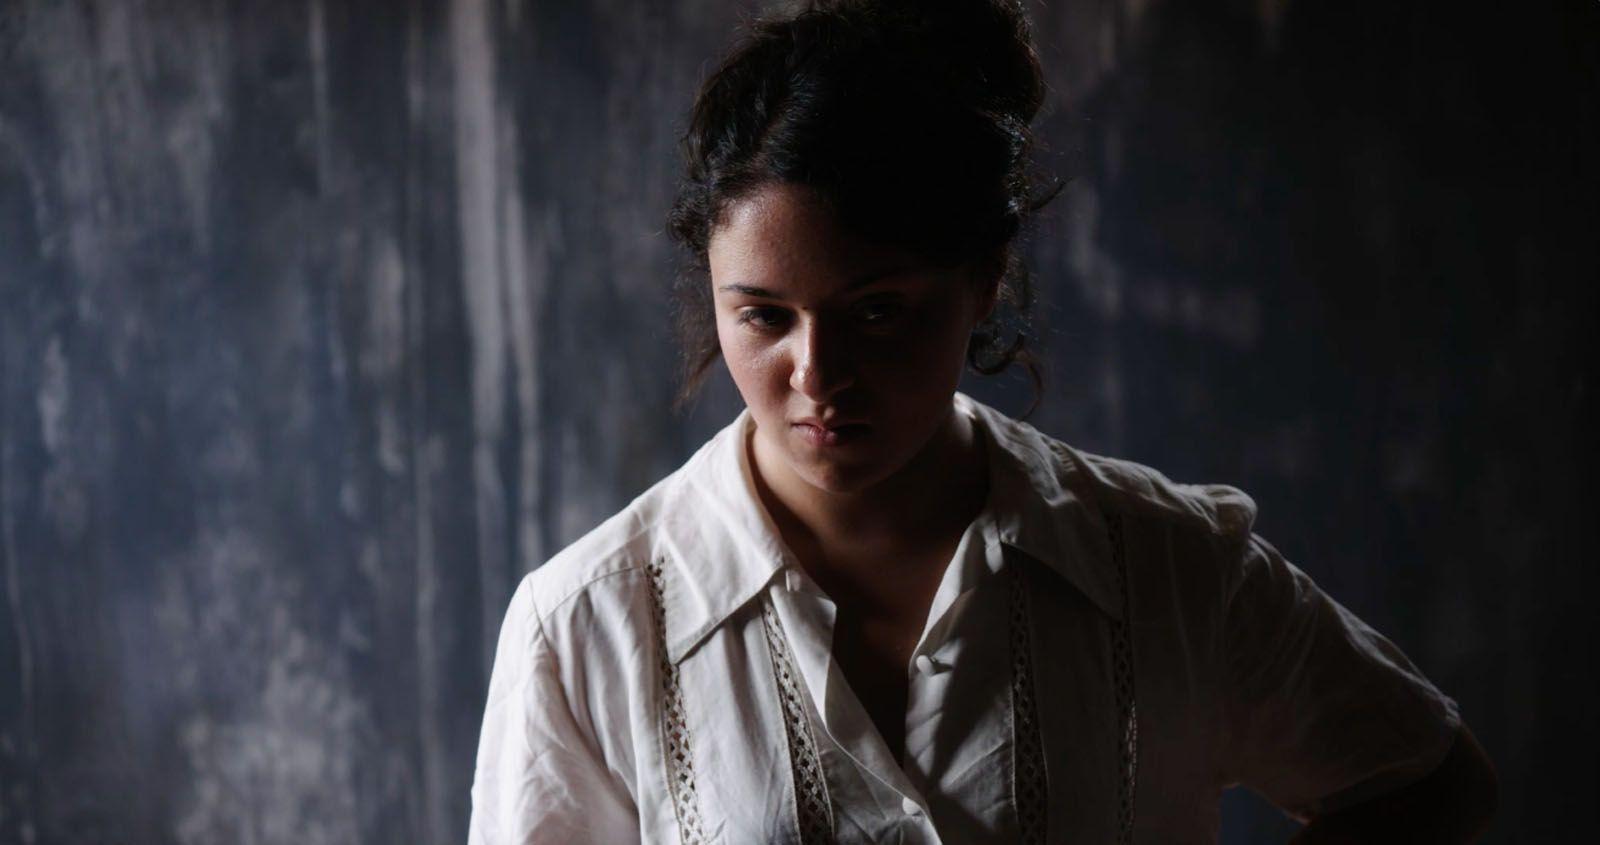 La maquisarde (BANDE-ANNONCE) de Nora Hamdi - Le 16 septembre 2020 au cinéma